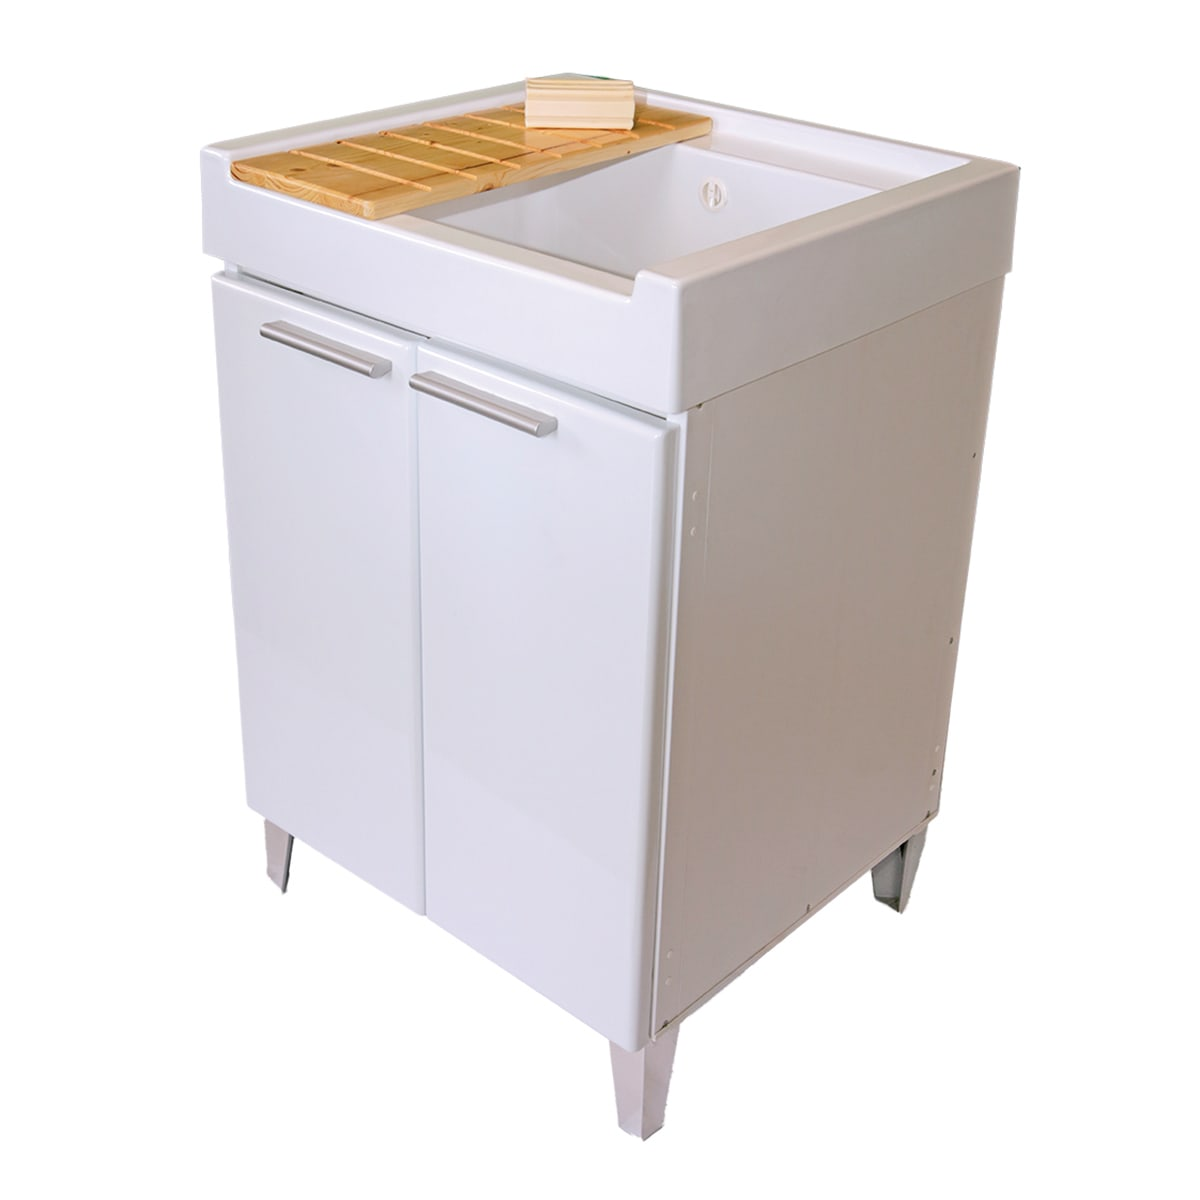 Cesta Bucato Leroy Merlin mobile lavanderia doni bianco l 59.2 x p 62.4 x h 84 cm